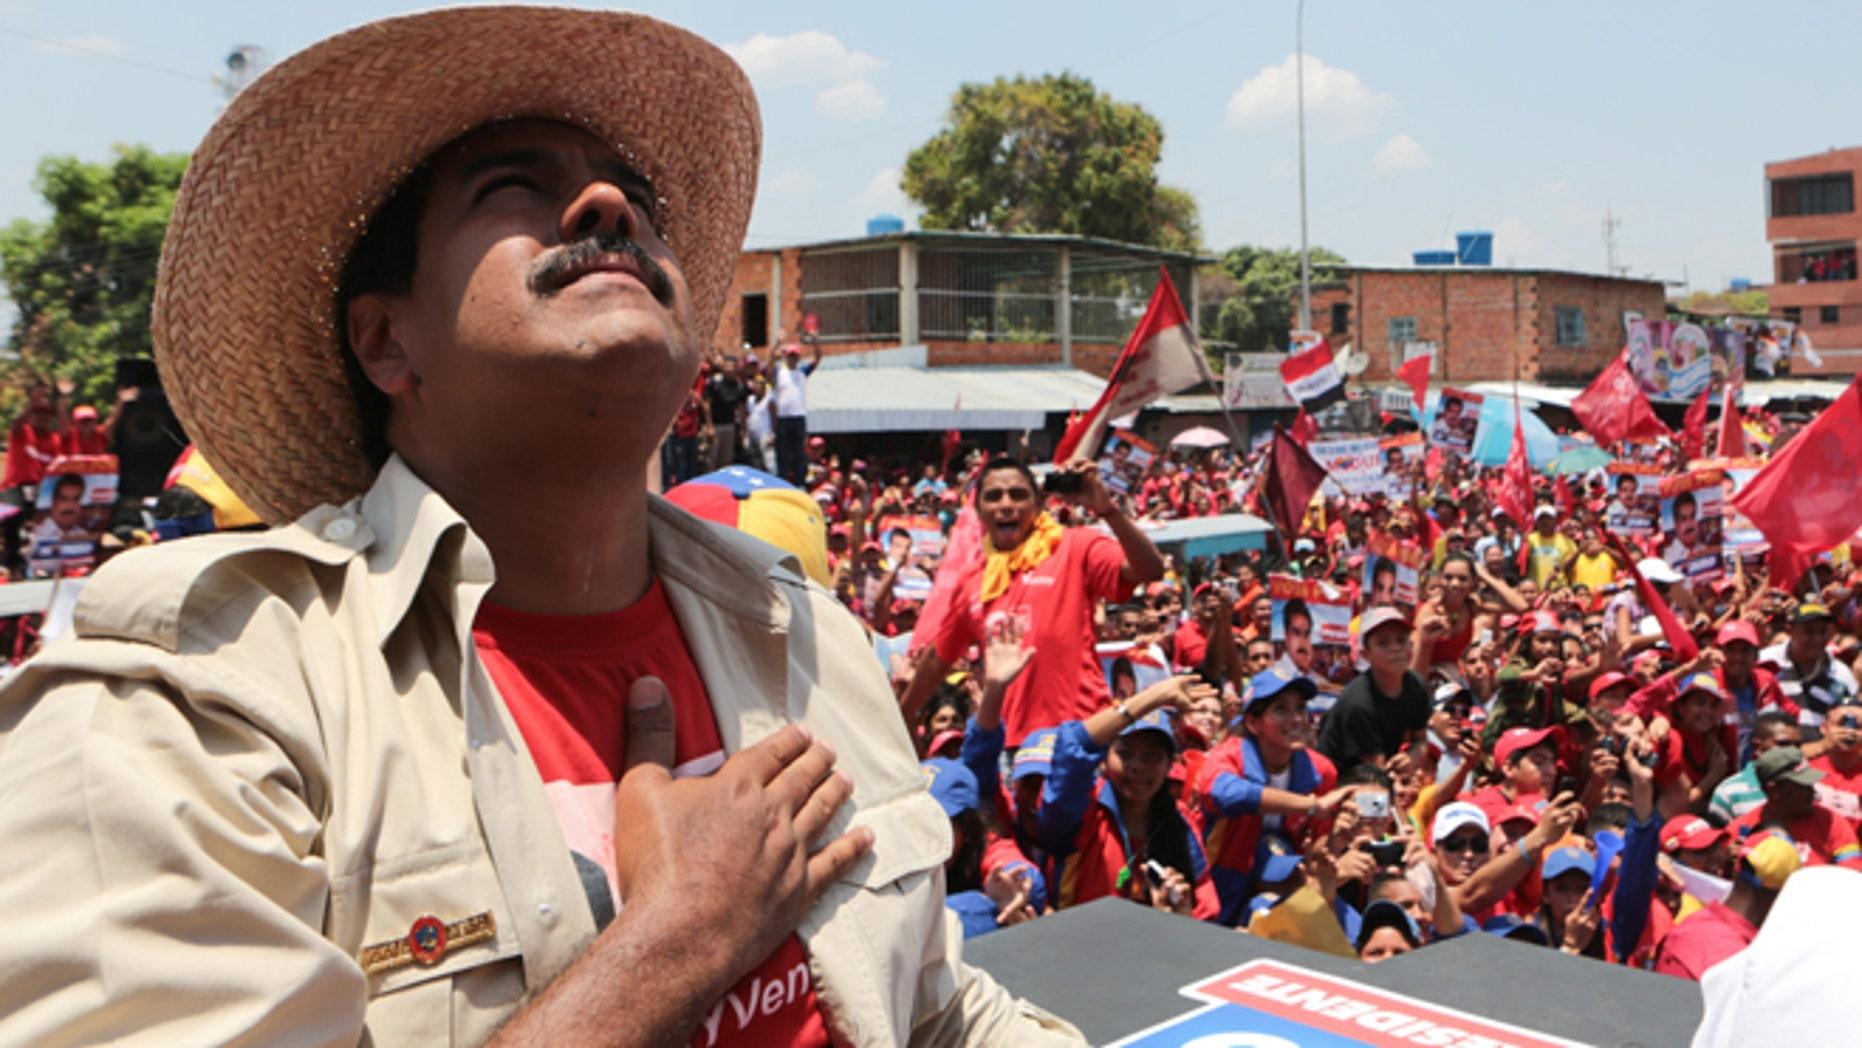 President Nicolas Maduro looks up during a campaign rally in San Fernando de Apure, Venezuela, Sunday, April 7, 2013.